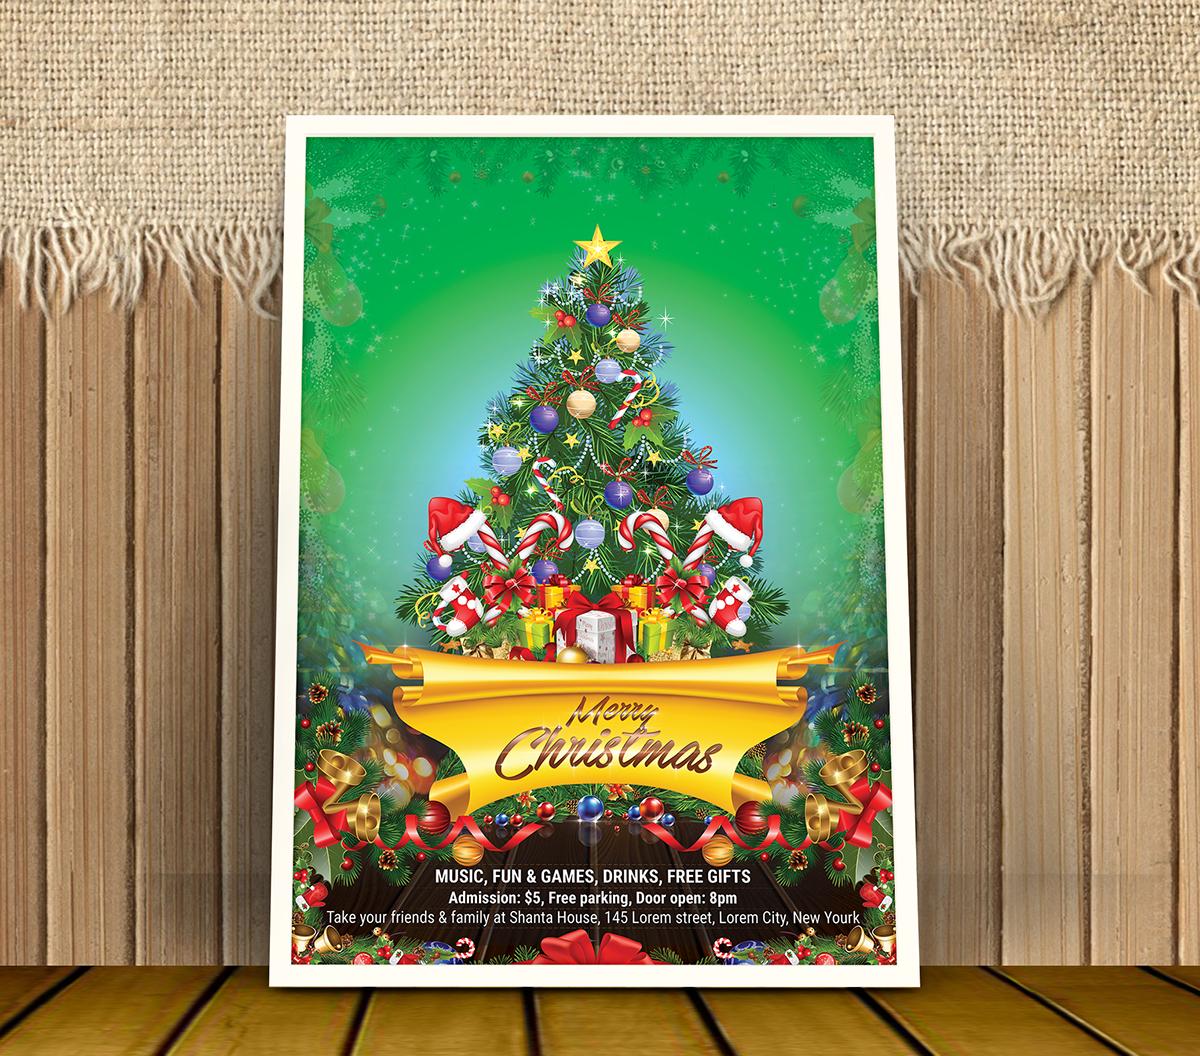 Christmas christmas flyer free christmas flyer christmas card christmas invitation card Christmas Invitation christmas poster free christmas poster Christmas Brochure free christmas brochure free christmas card christmas day card christmas day flyer a4 christmas flyer a4 christmas card